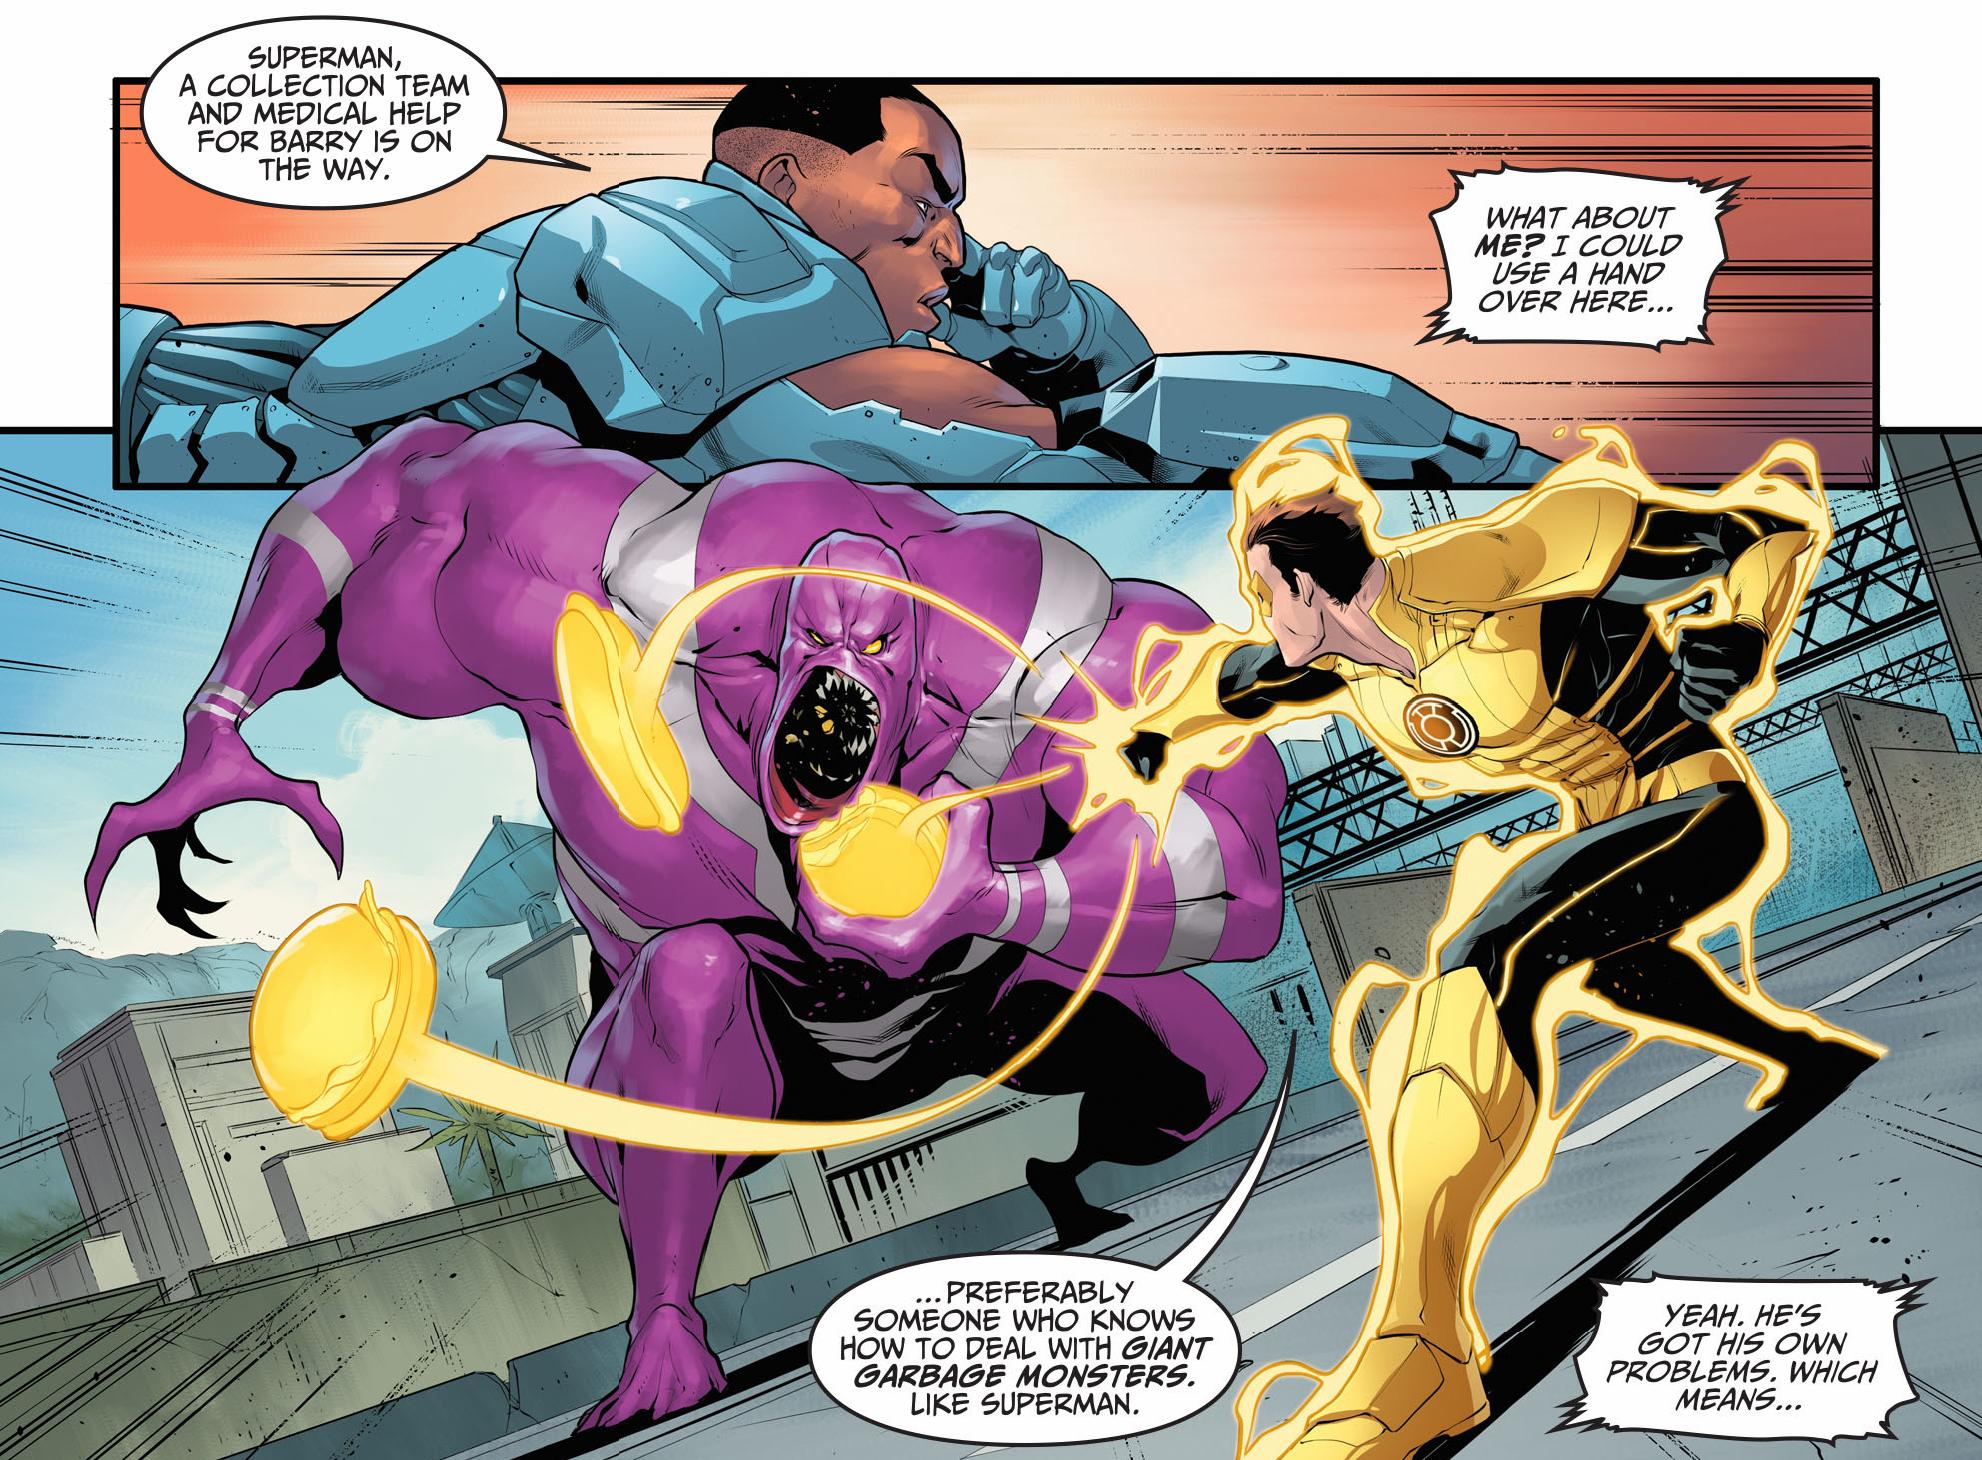 cyborg and yellow lantern (hal jordan) vs parasite